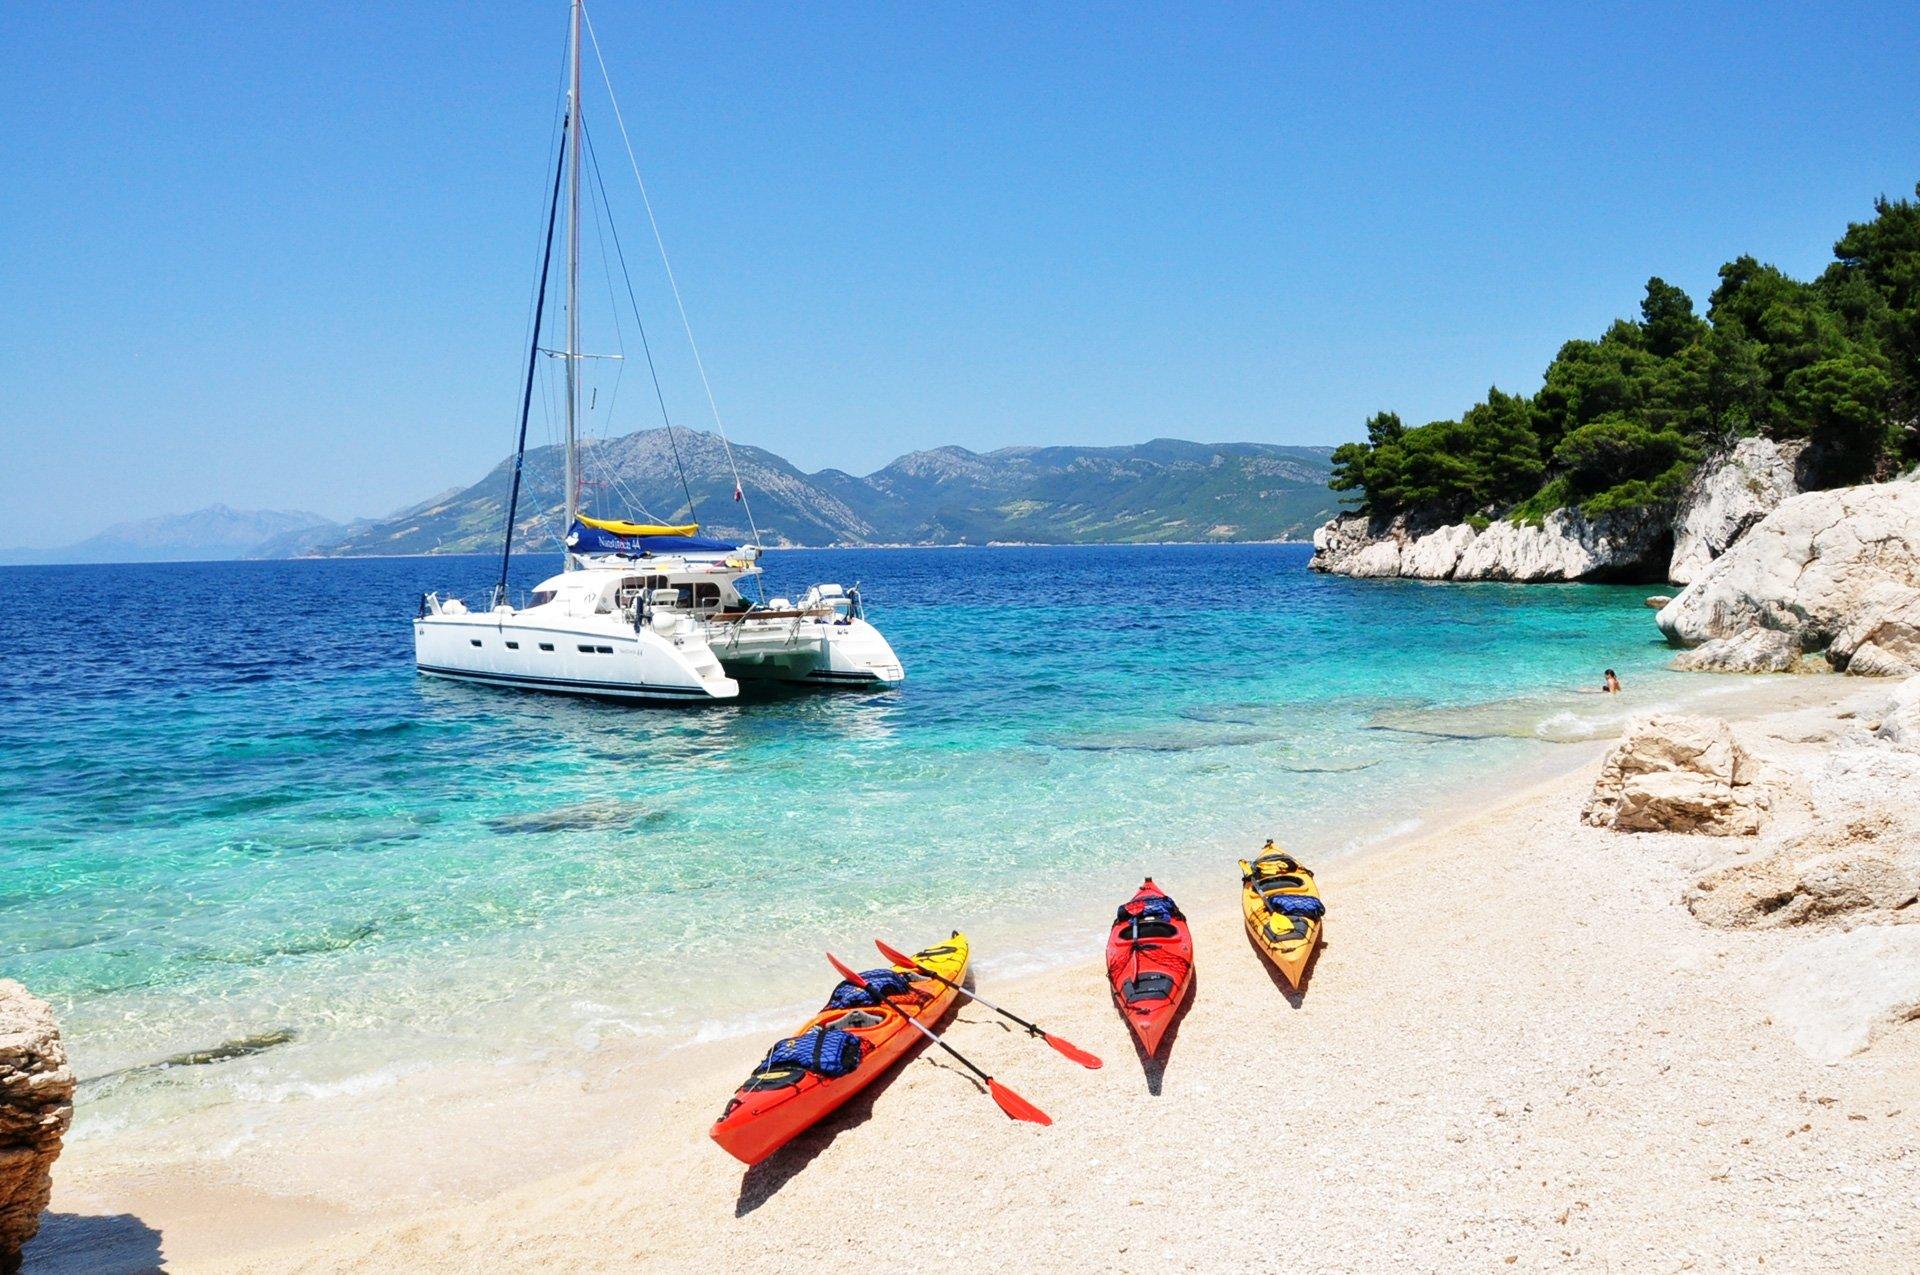 Catamaran and kayaks on the beach